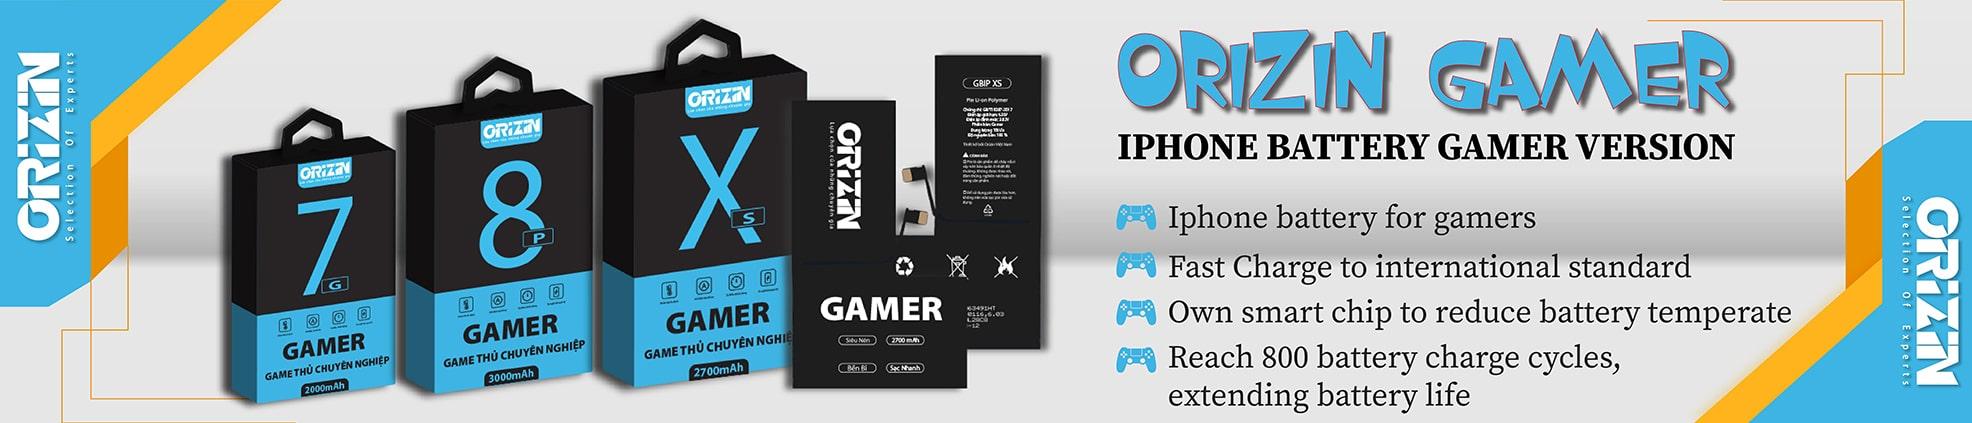 Pin Iphone Phiên Bản Gamer